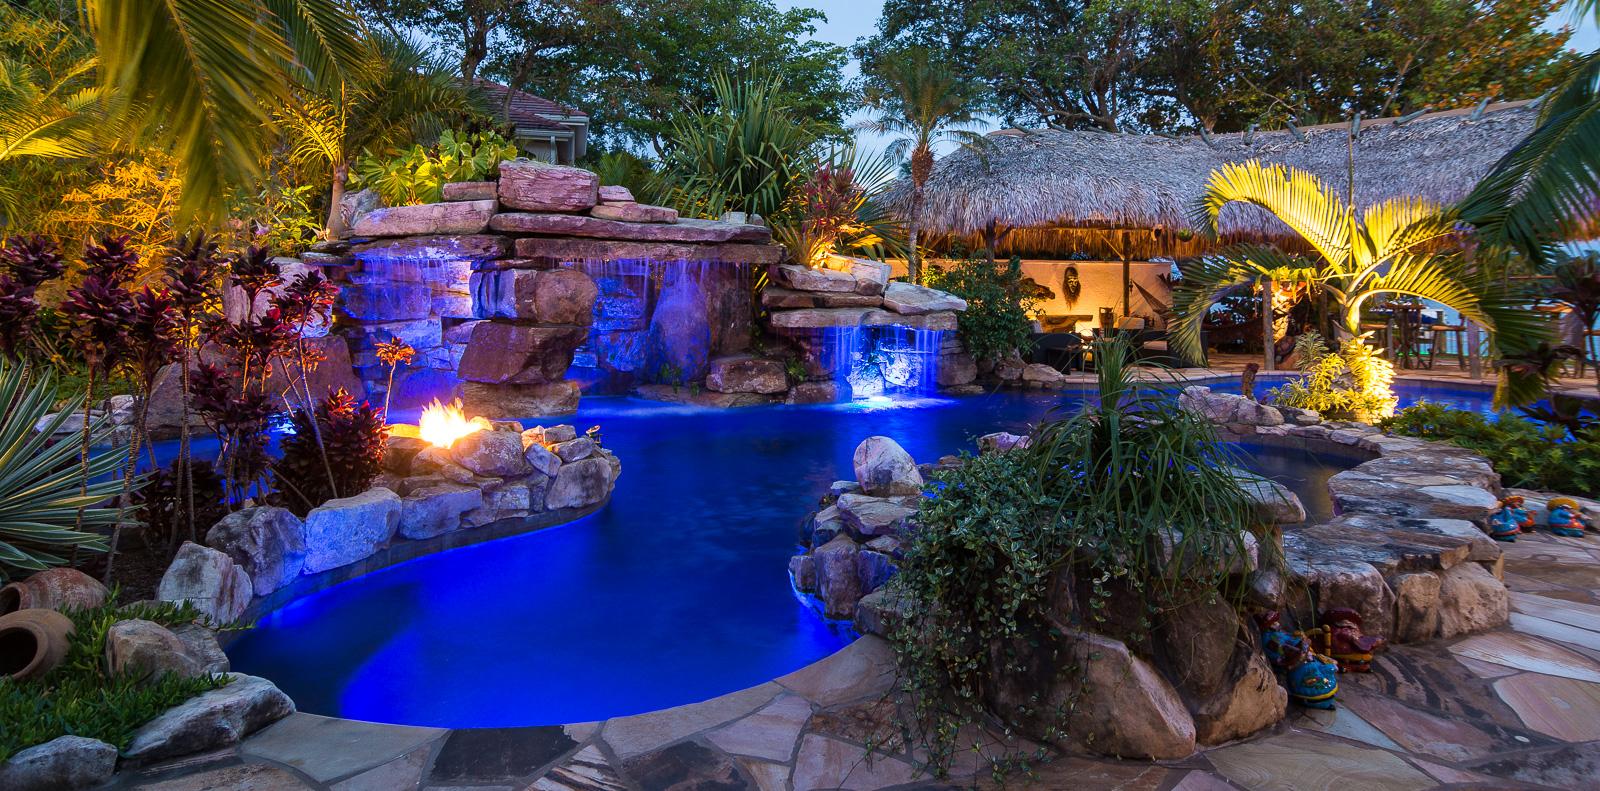 Design Waterfall Pools custom rock waterfall pool grotto spa natural stream tiki hut siesta key pools tiki